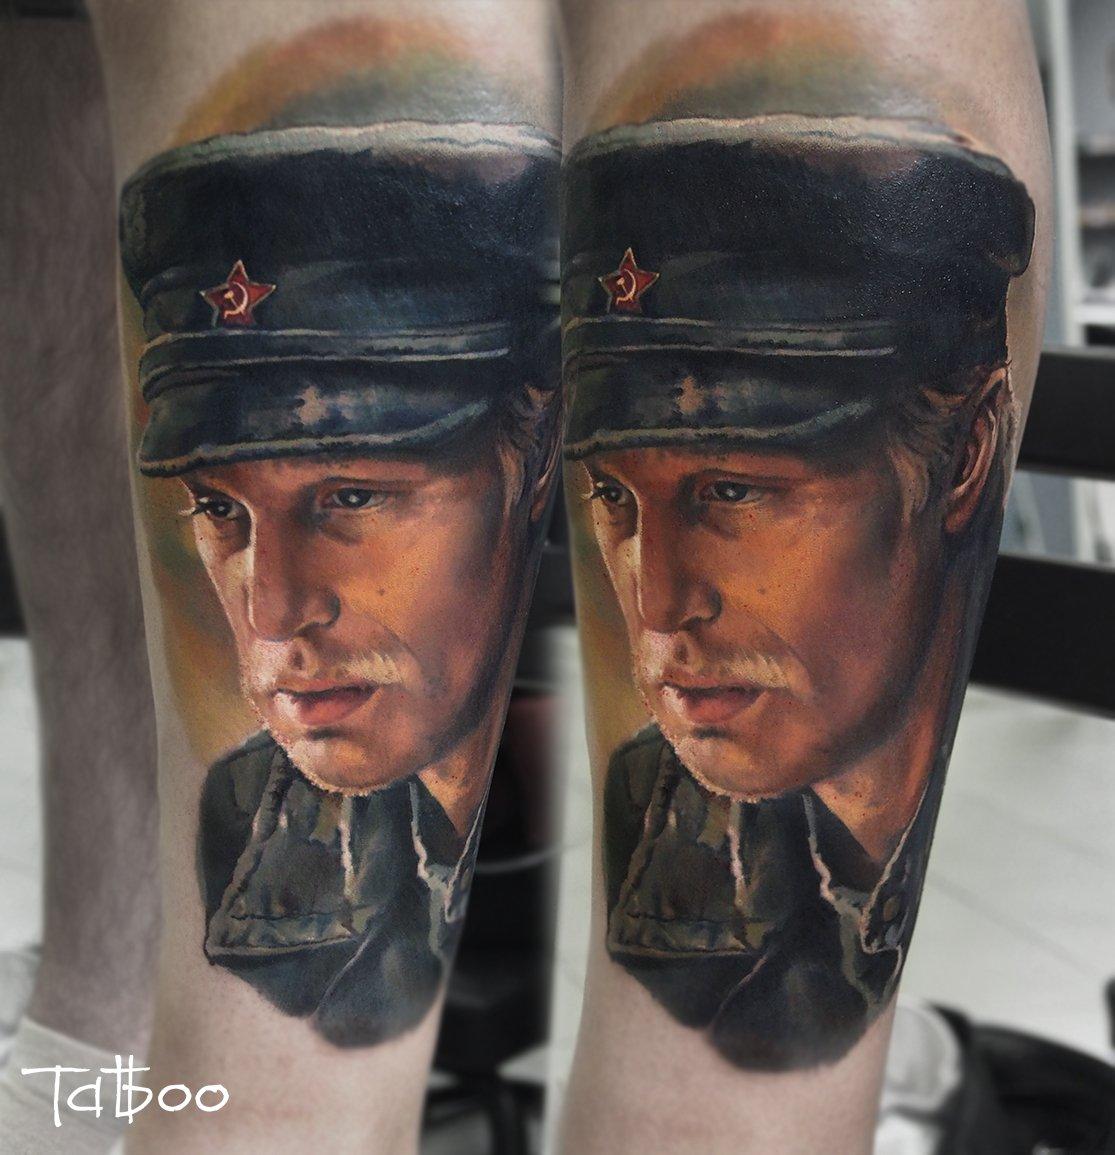 Cg9suLSW0AAxIAG - Tatuagens realistas da russa Valentina Ryabova